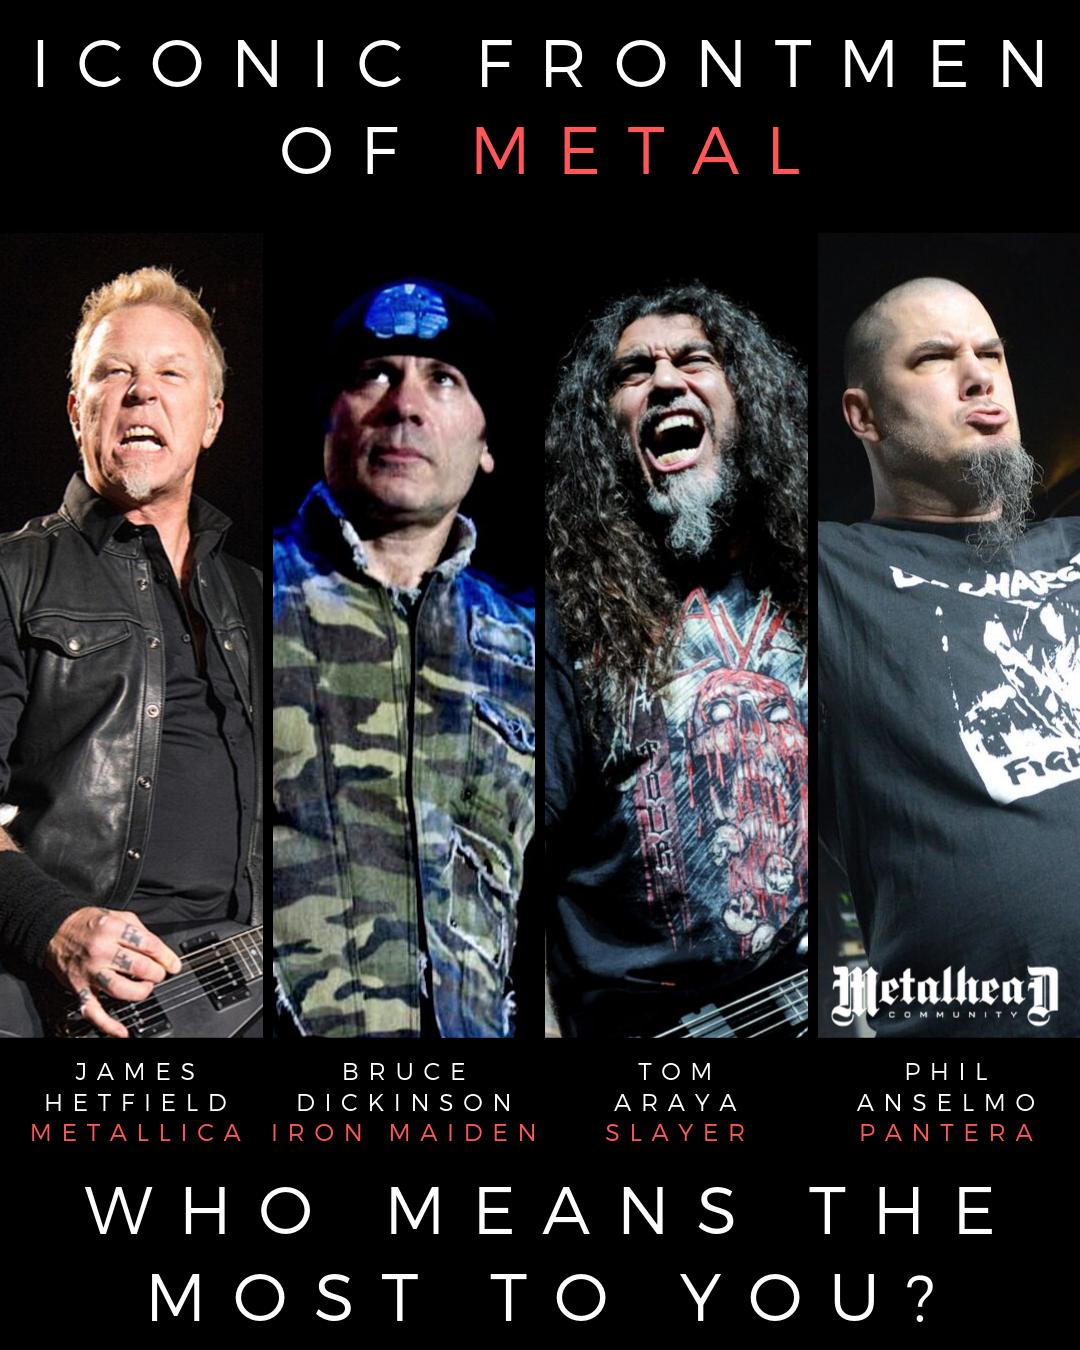 Iconic Frontmen Of Metal Music Metal Songs Heavy Metal Music Heavy Metal Bands